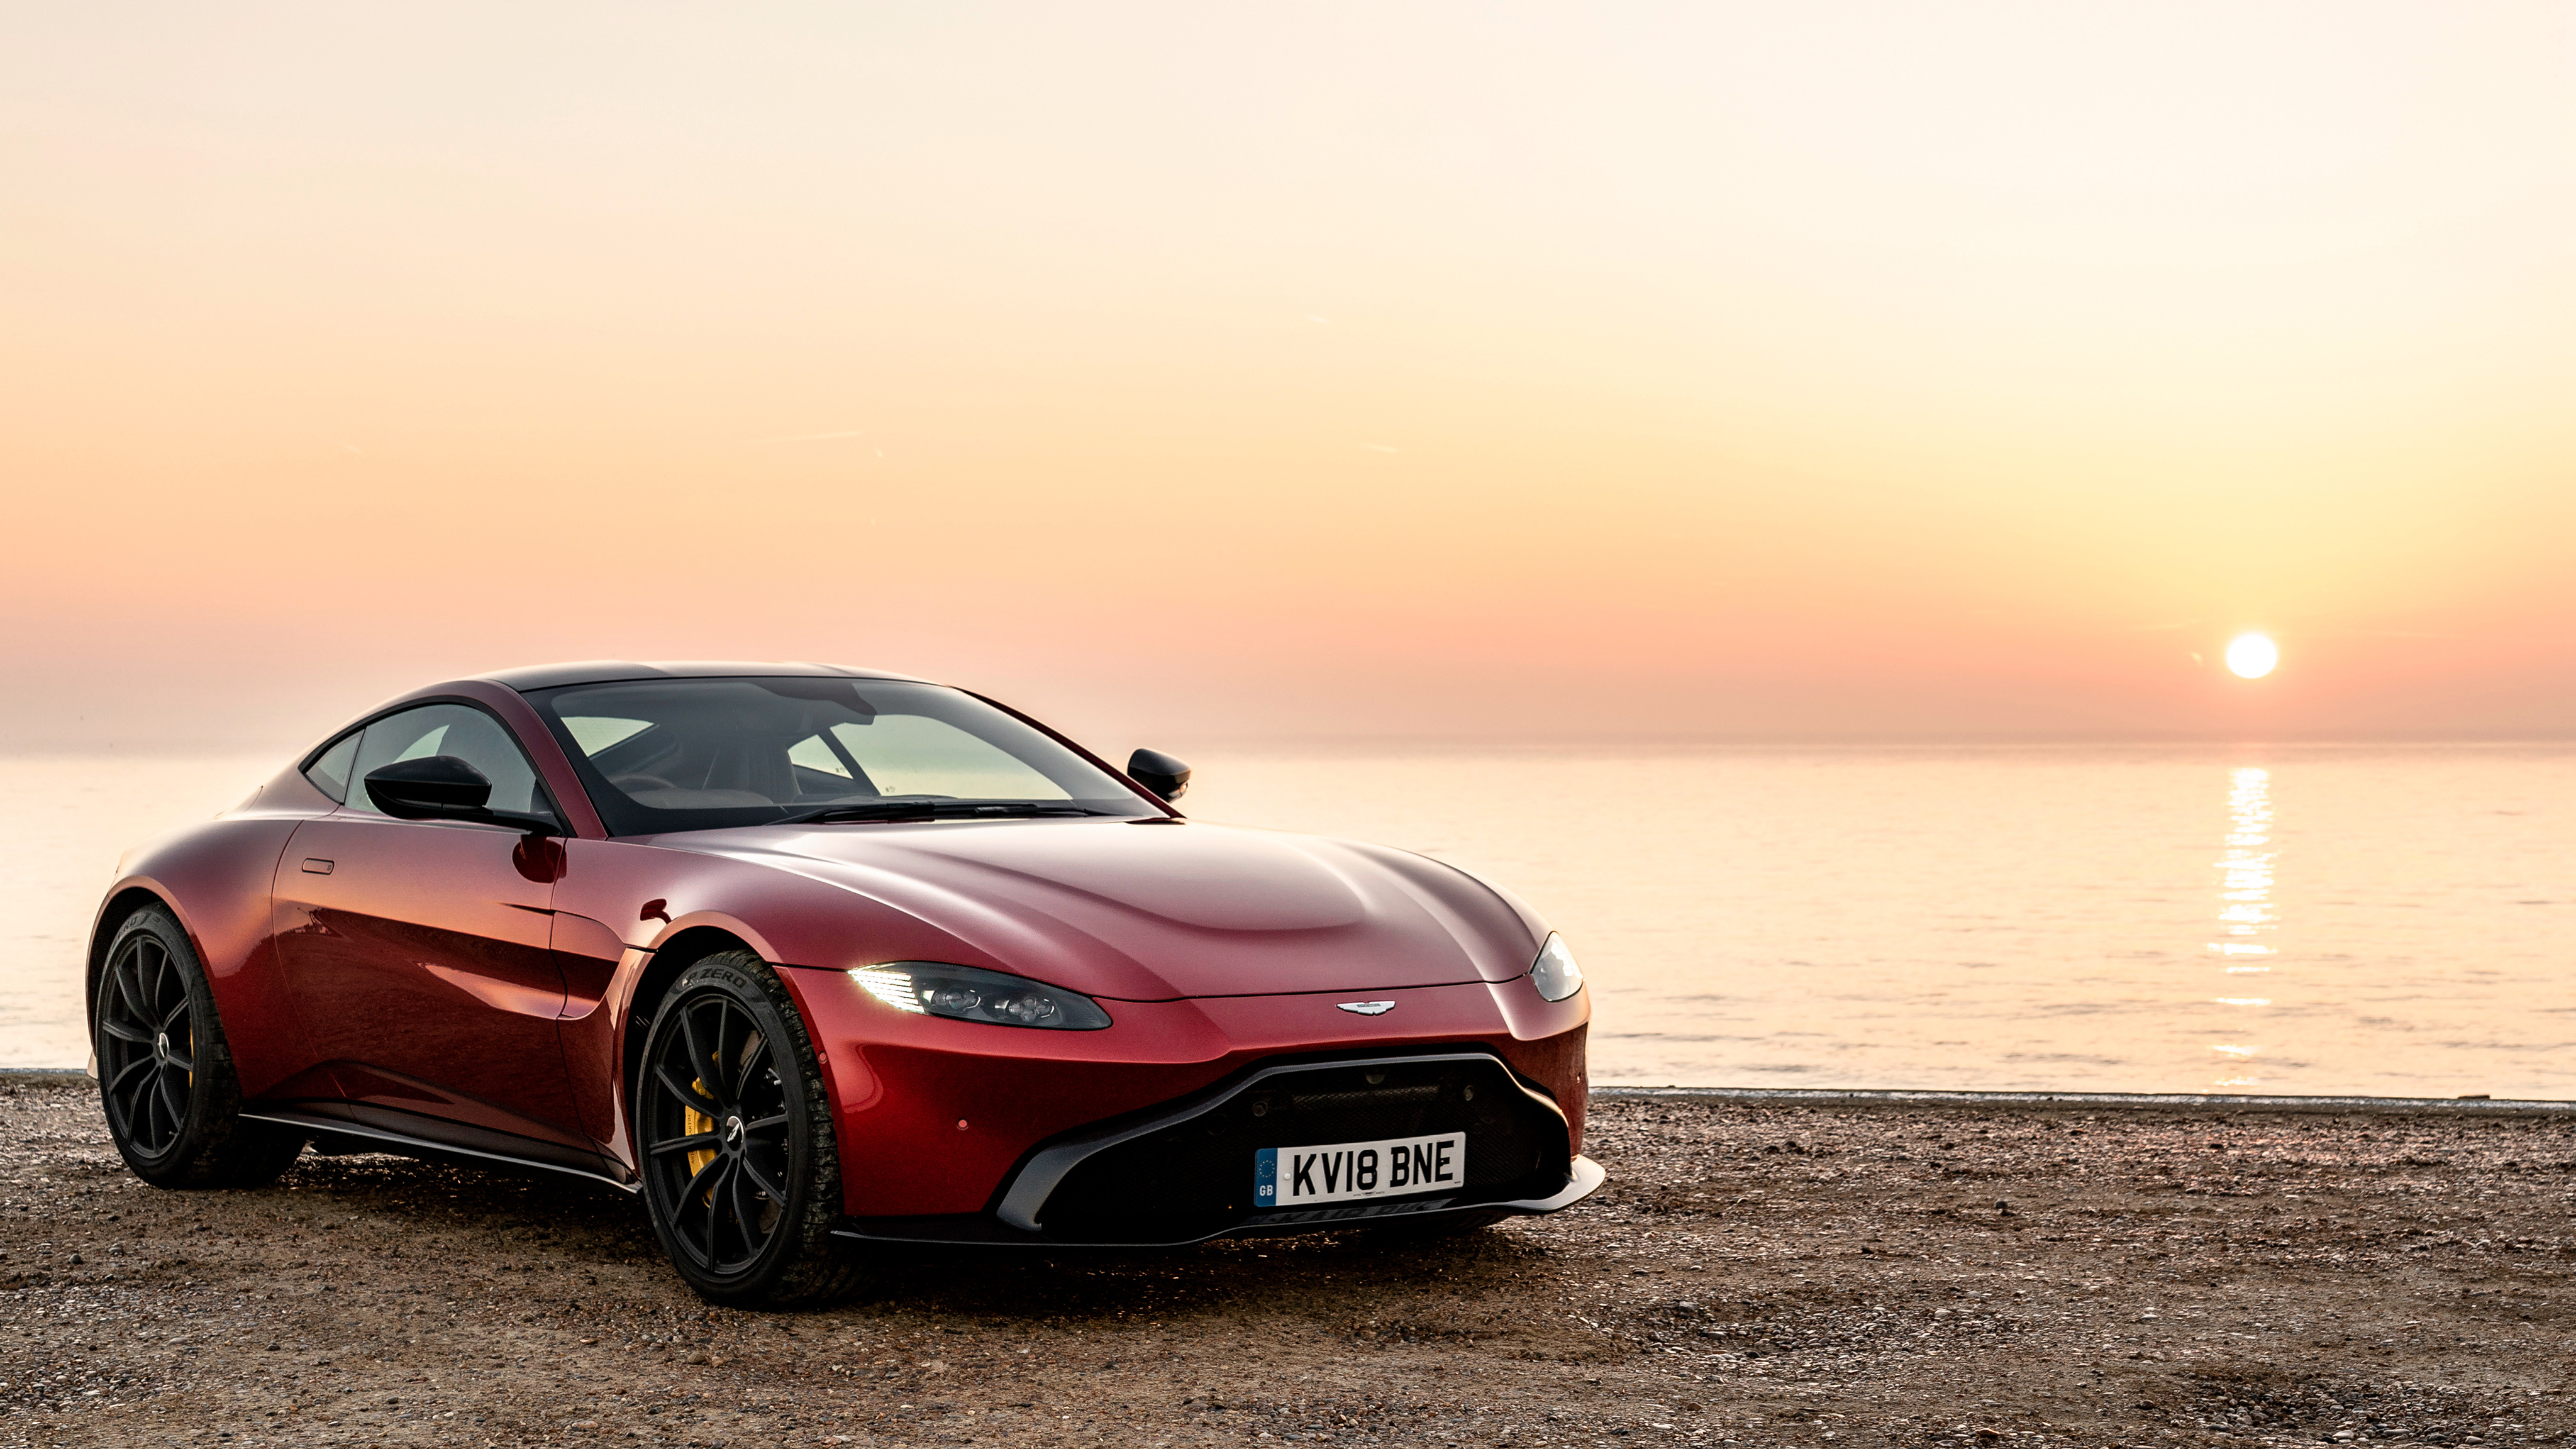 Aston Martin Vantage 2019 4k Wallpaper Hd Car Wallpapers Id 11744